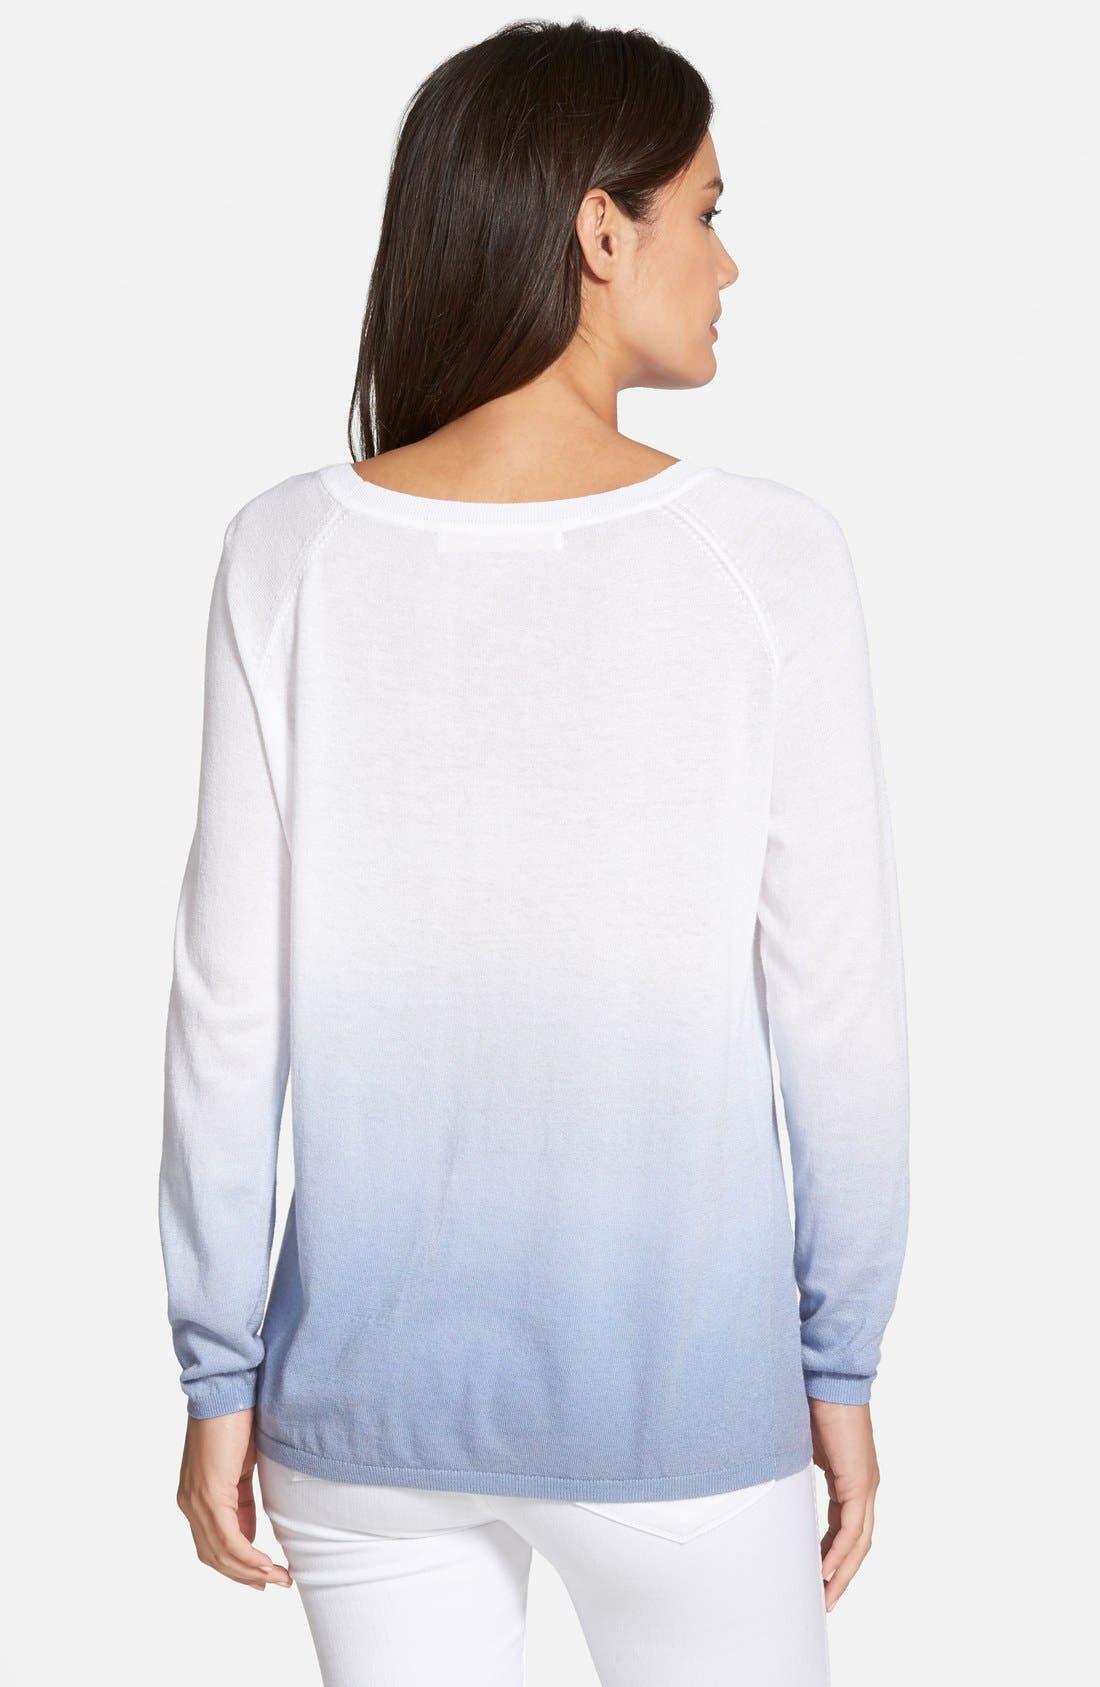 Alternate Image 2  - Nordstrom Collection 'Lula' Dip Dye Cotton Blend Sweater